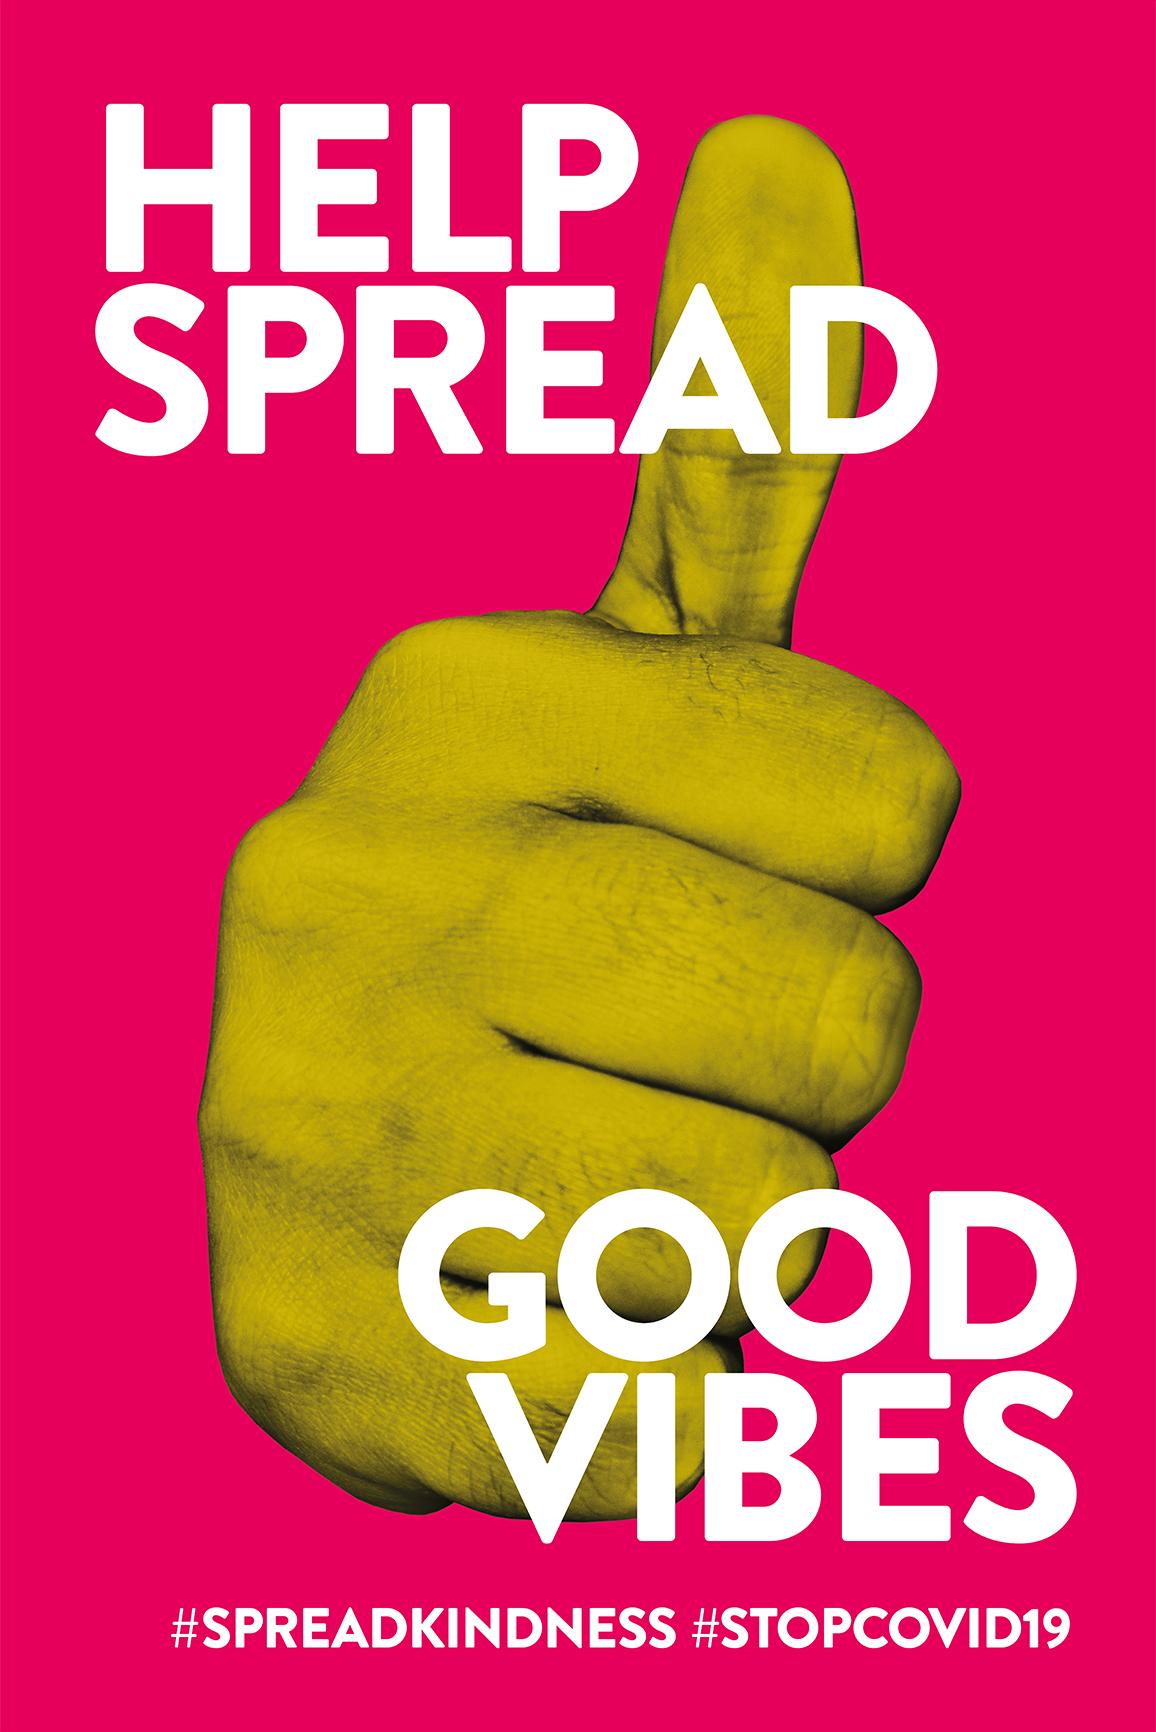 Help spread good vibes